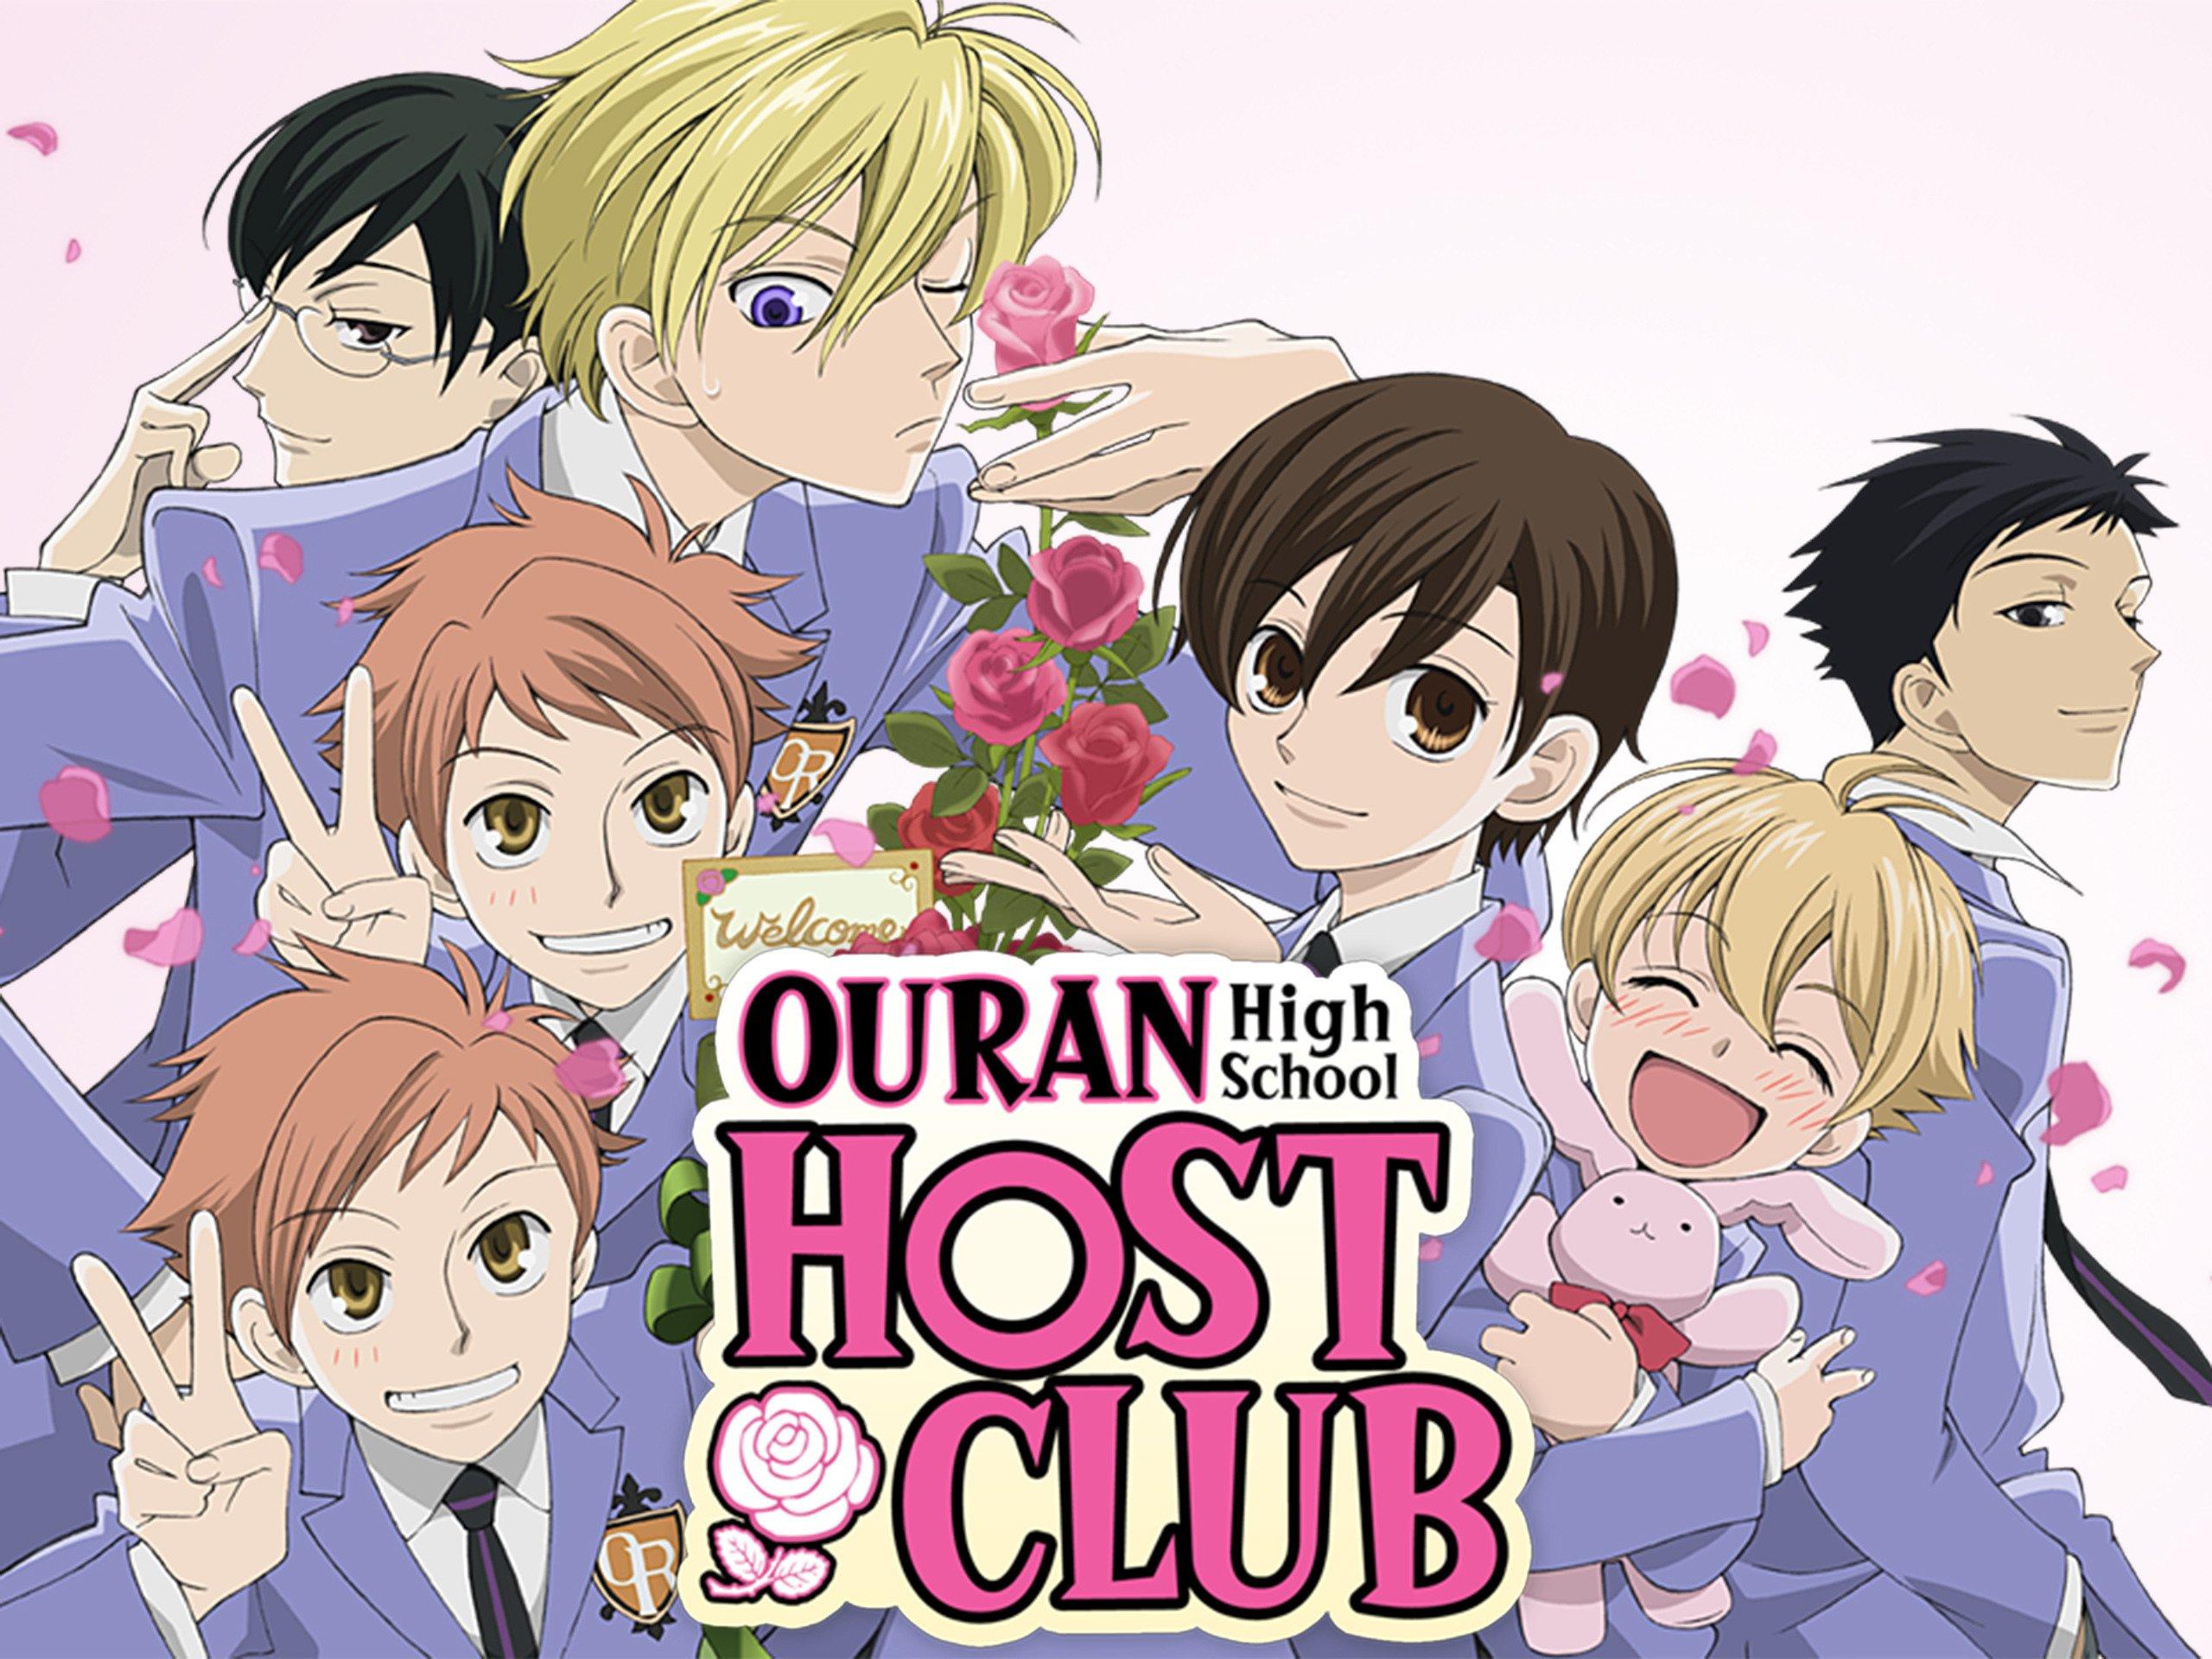 Ouran high school dating sim staffordshire dating free